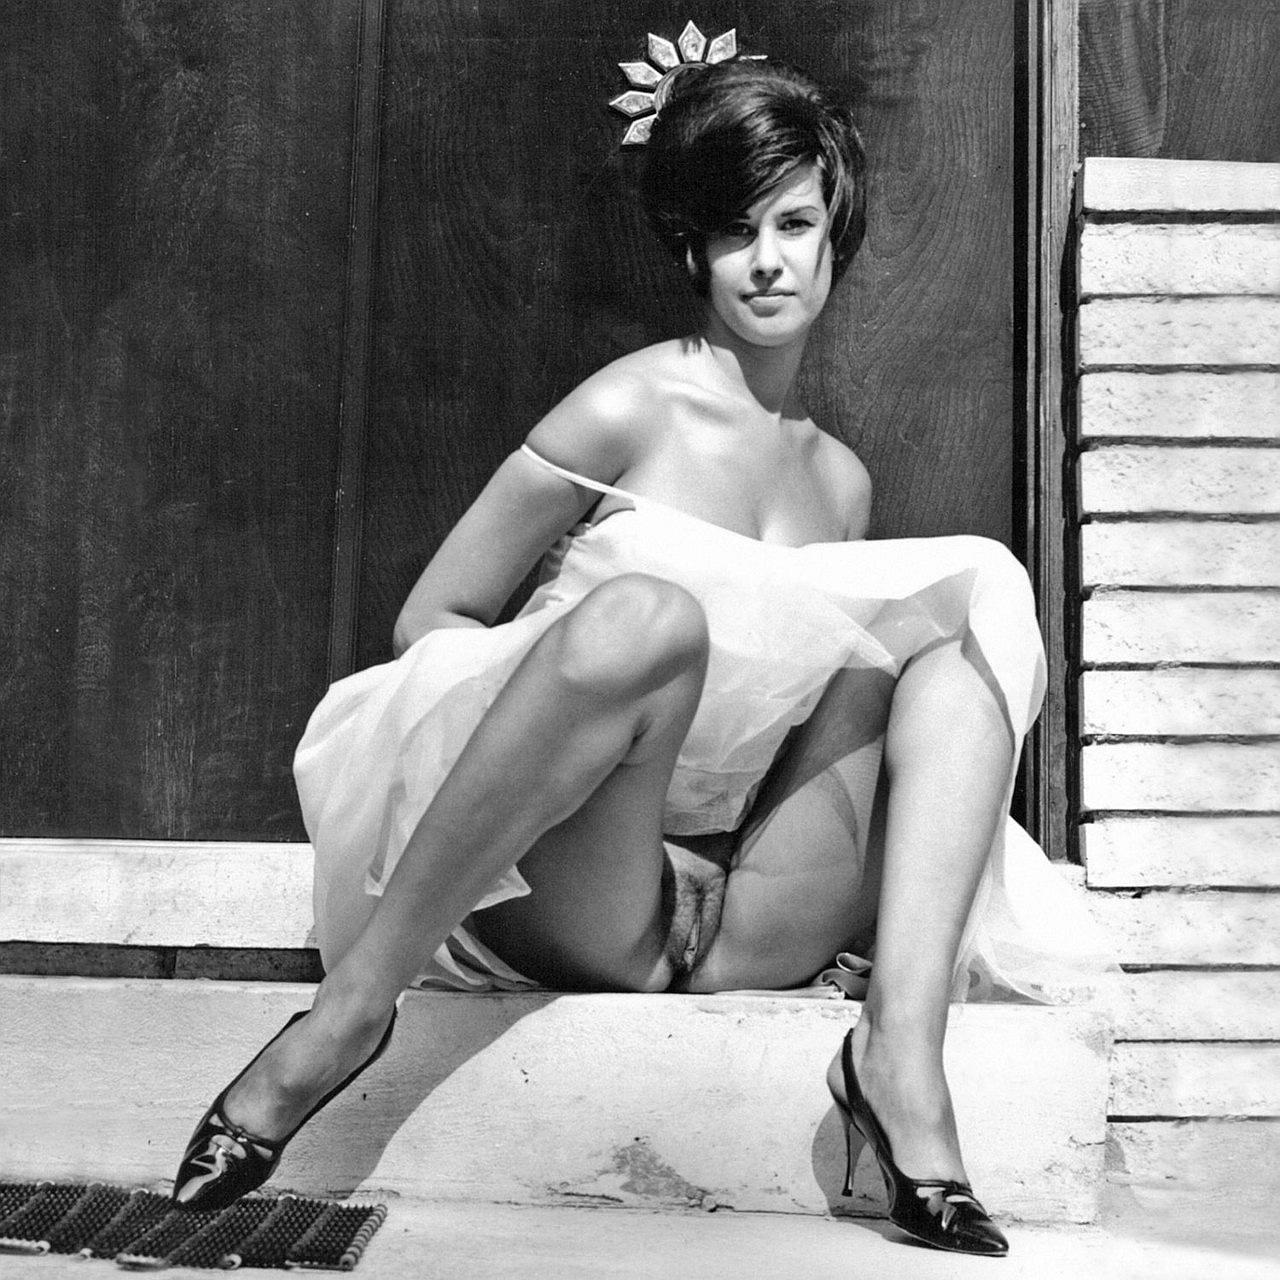 free-amature-picture-posts-erotic-photographs